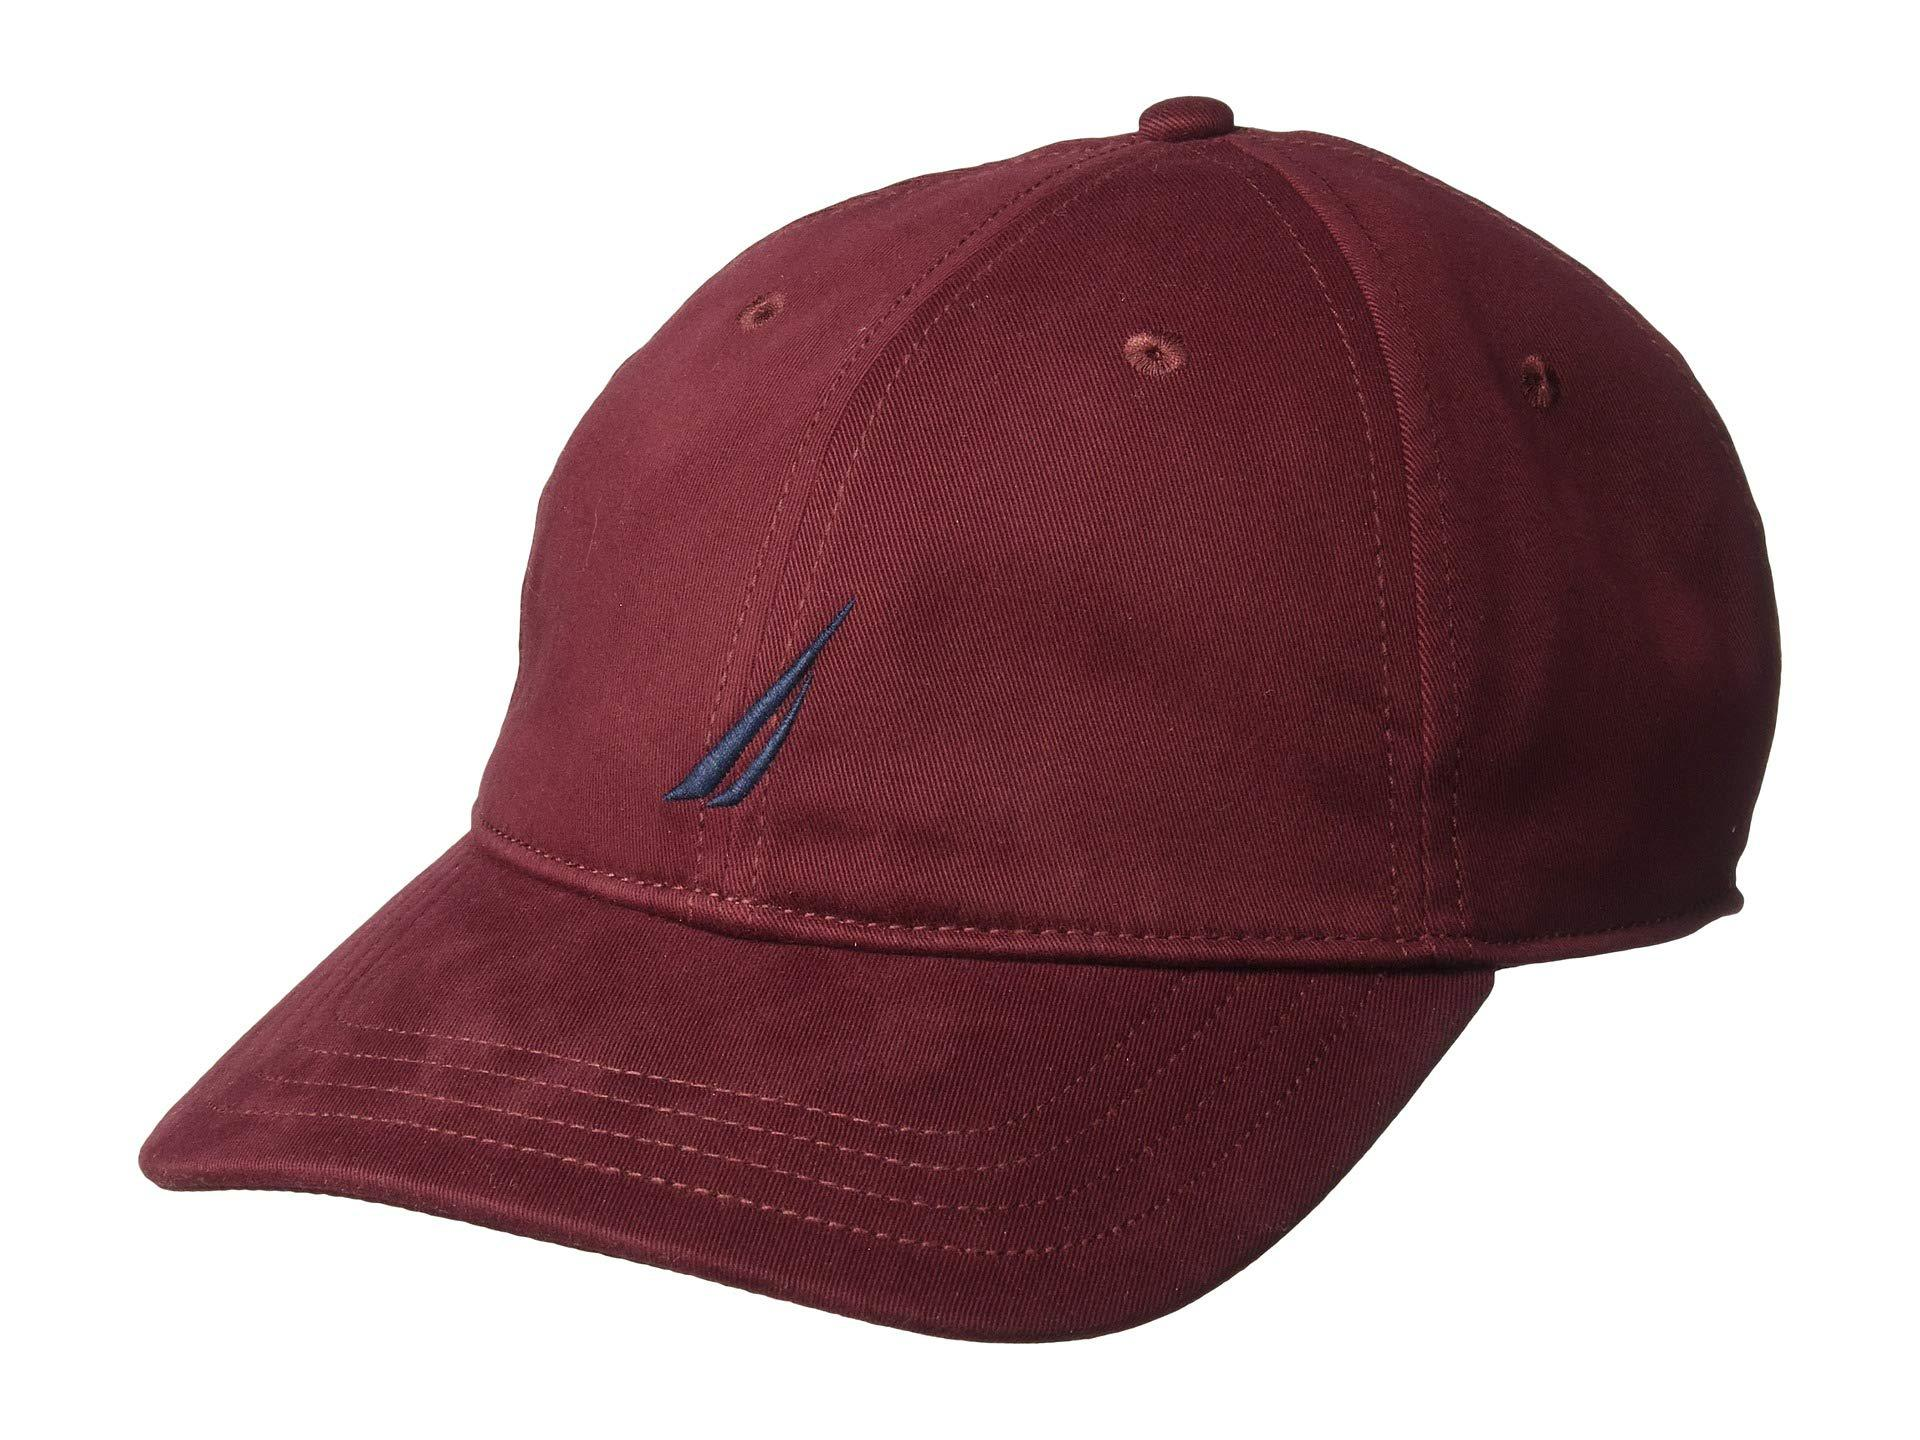 85ebc0a4178fe Nautica J Class 6 Panel Hat (castle Rock) Caps in Red for Men - Lyst